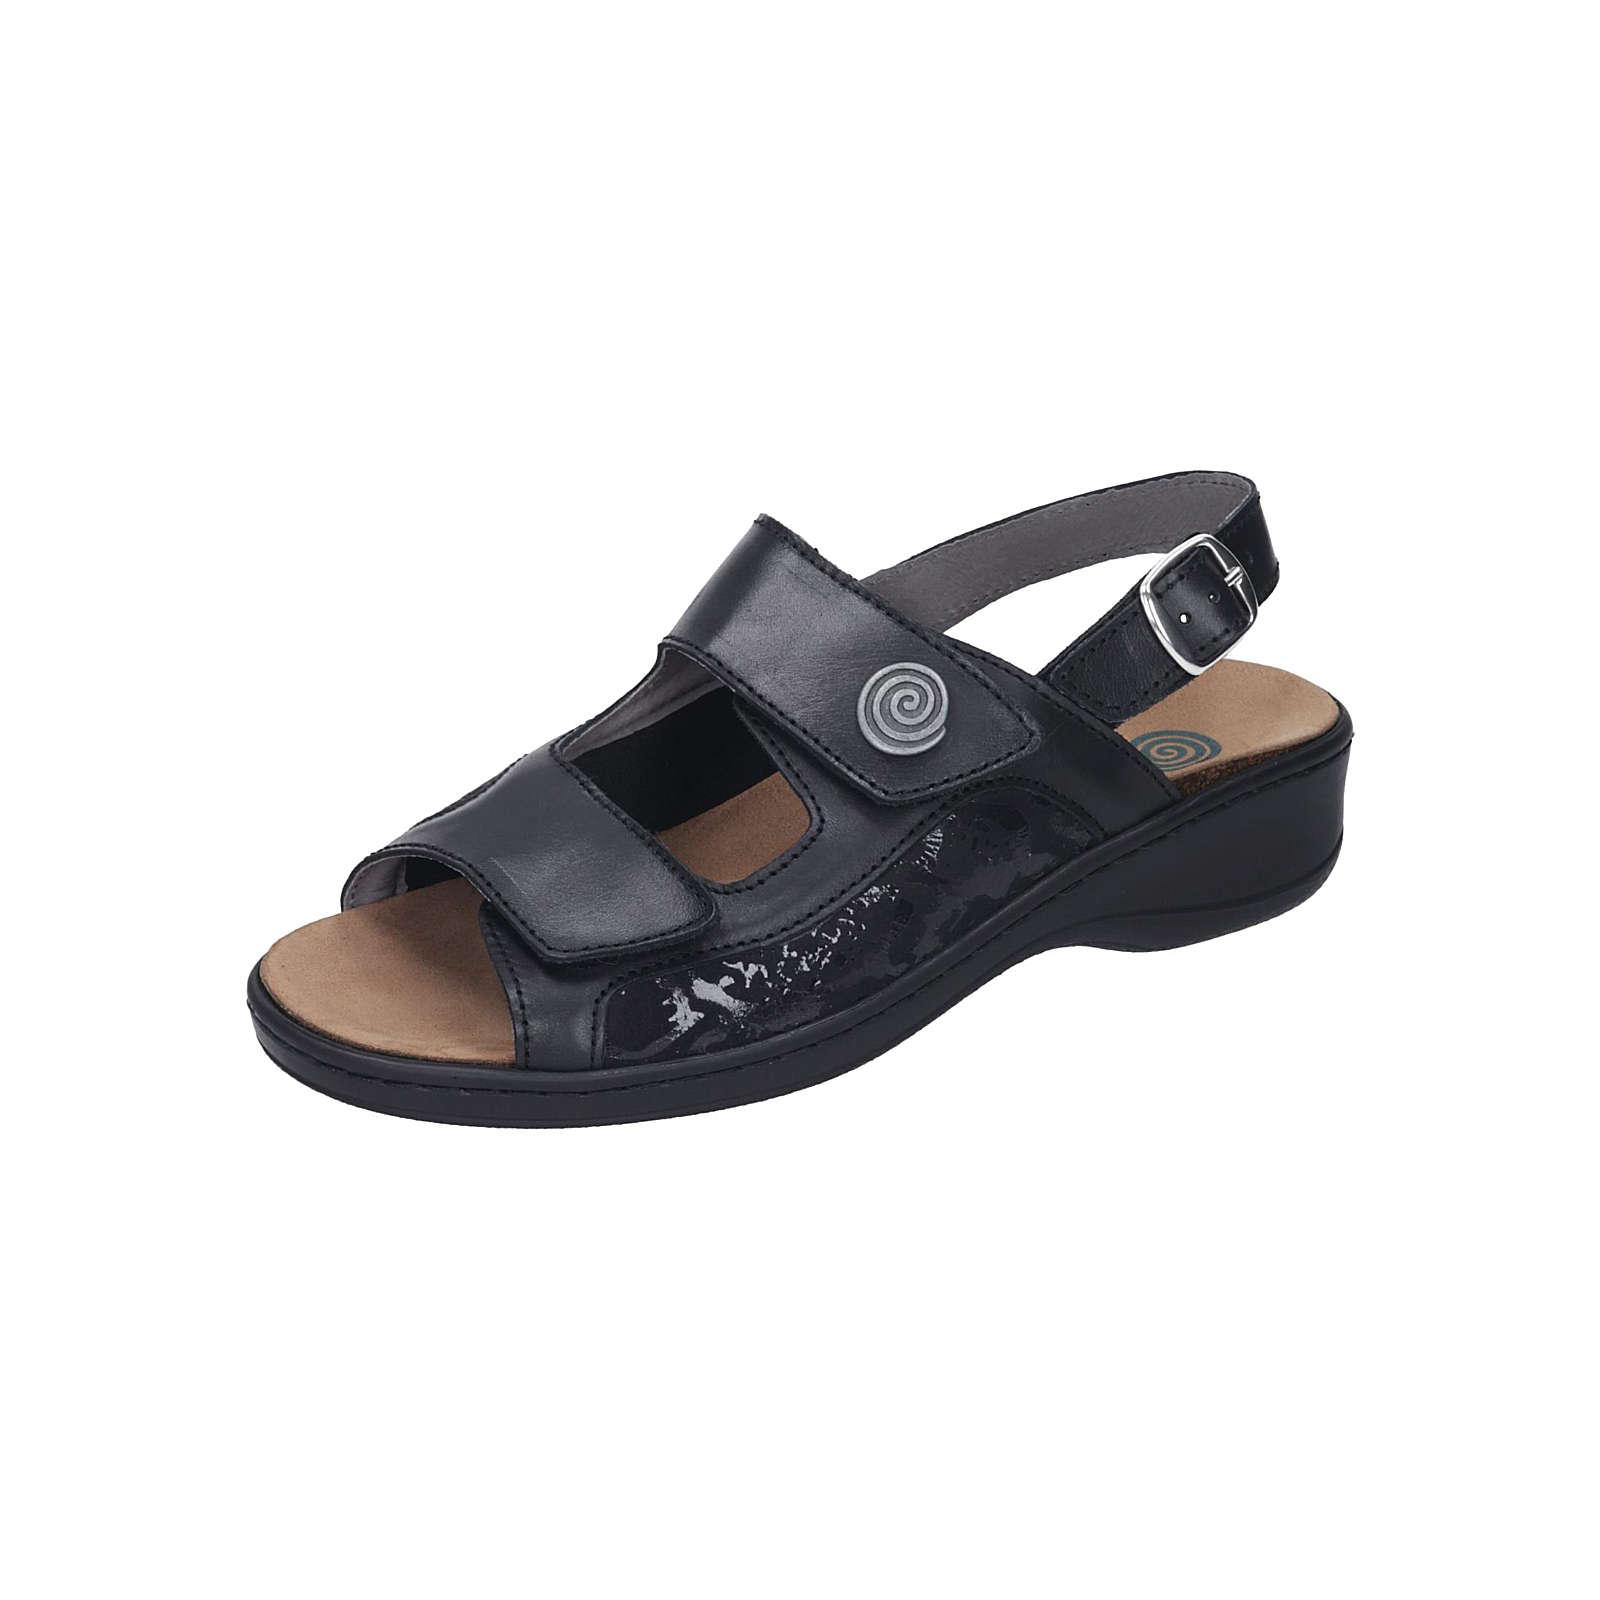 Dr. BRINKMANN Damen Sandale Komfort-Sandalen schwarz Damen Gr. 35